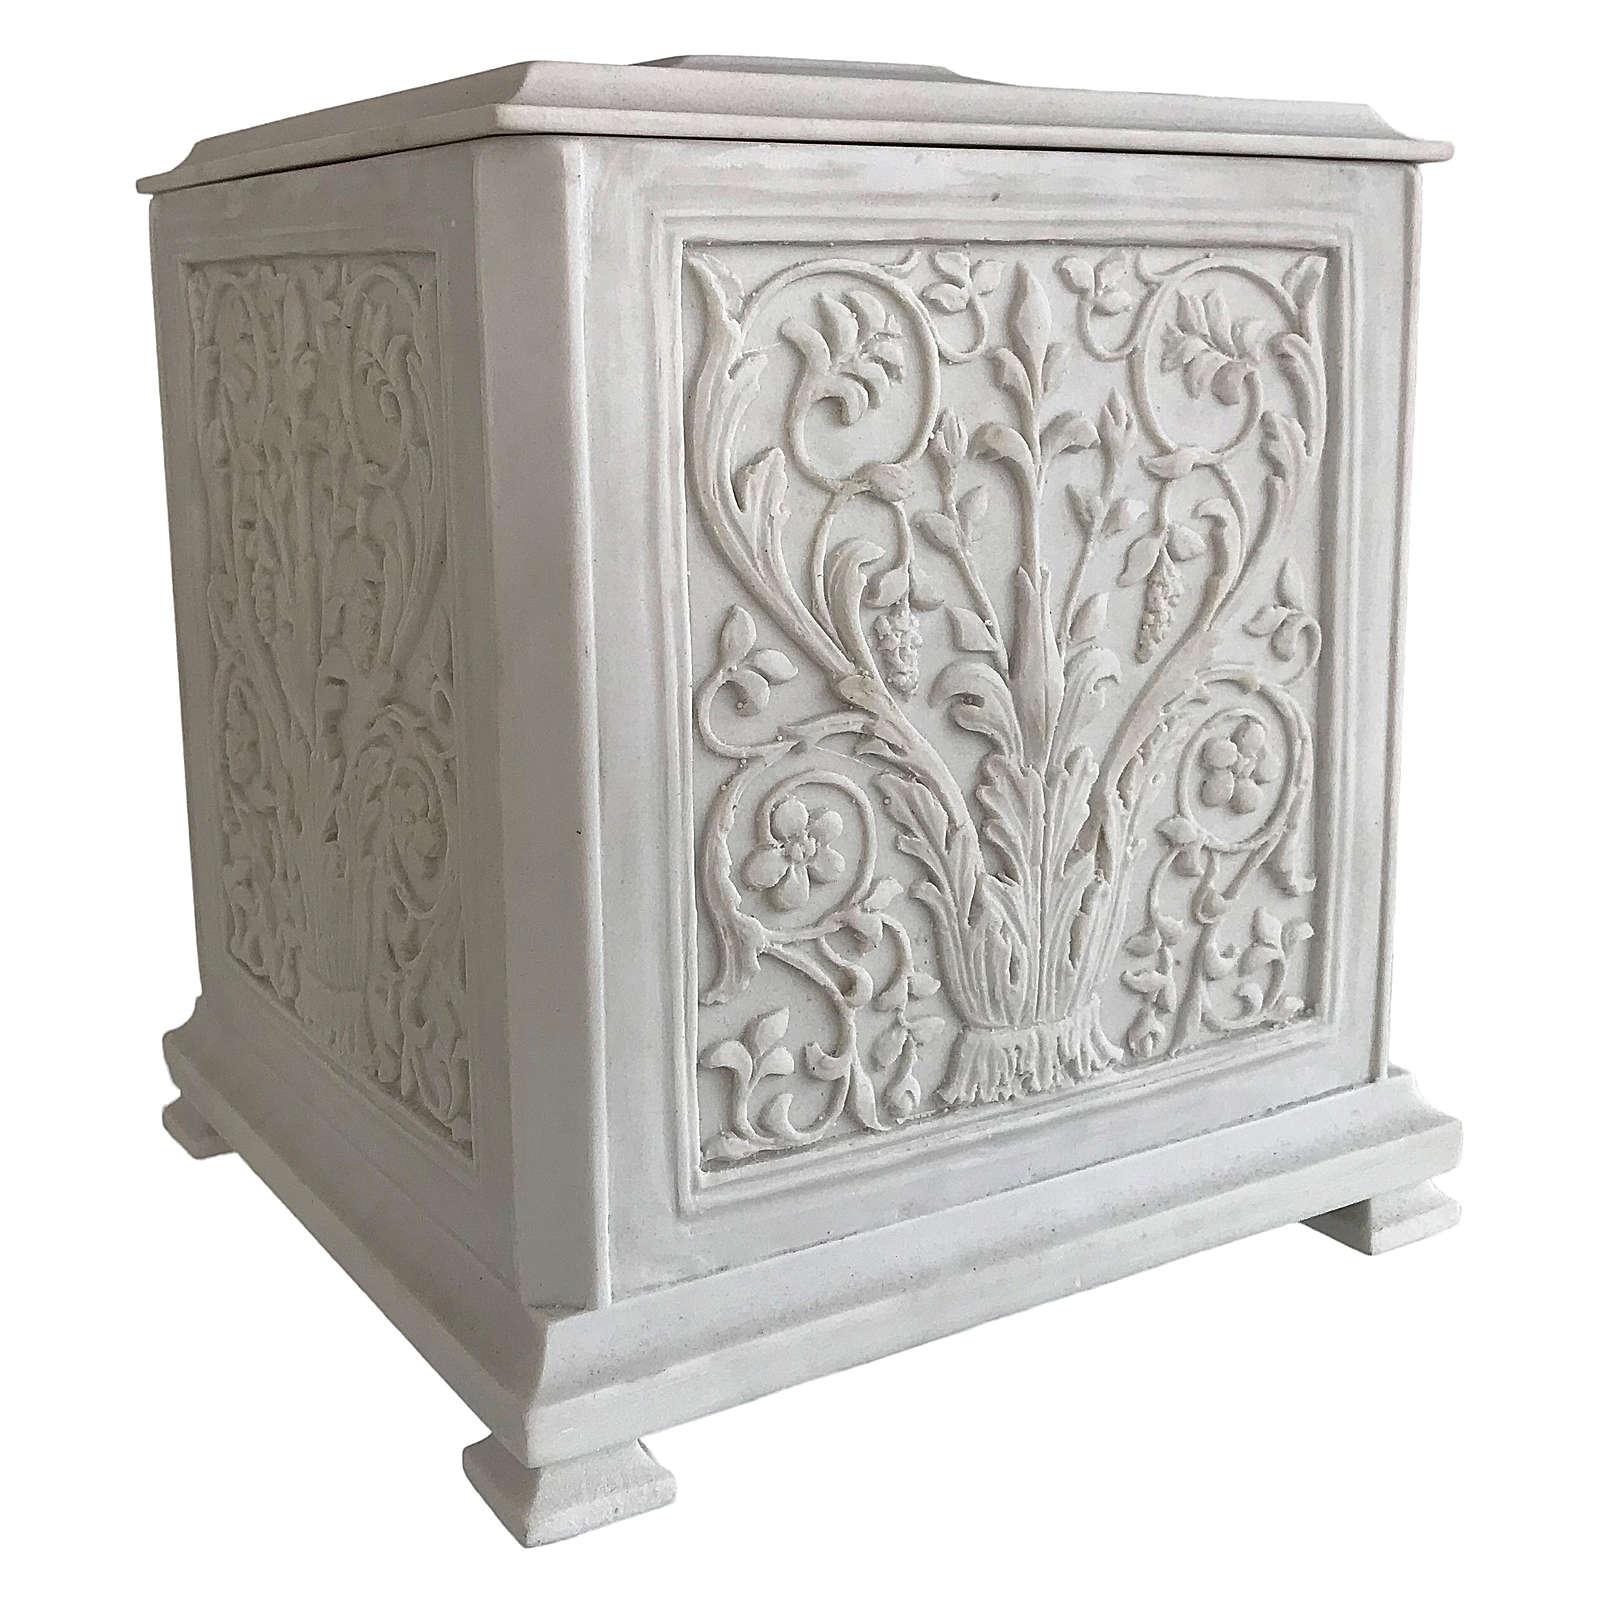 Urna cineraria Renaissance quadrata polvere di marmo levigata 3